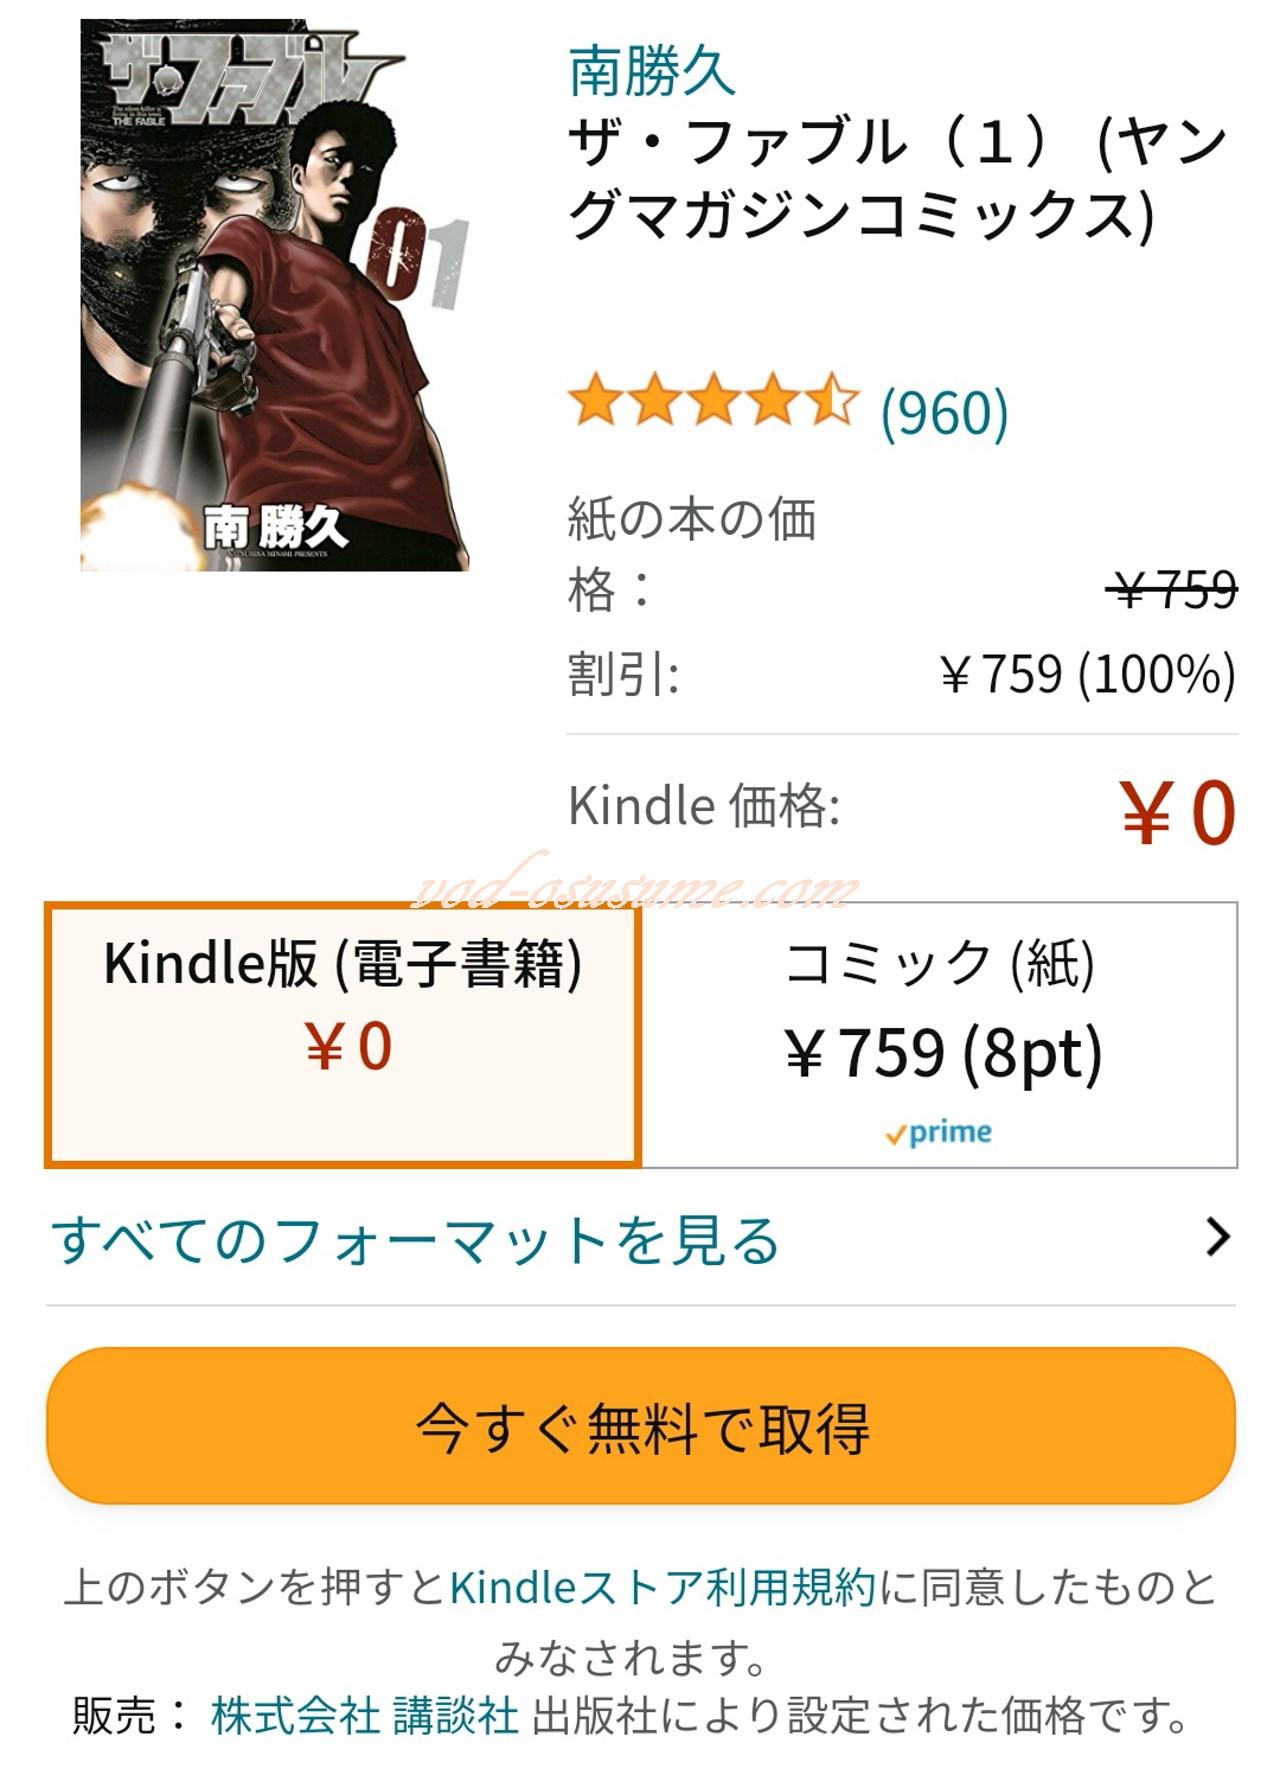 Kindleで『ザ・ファブル』の第1巻が0円